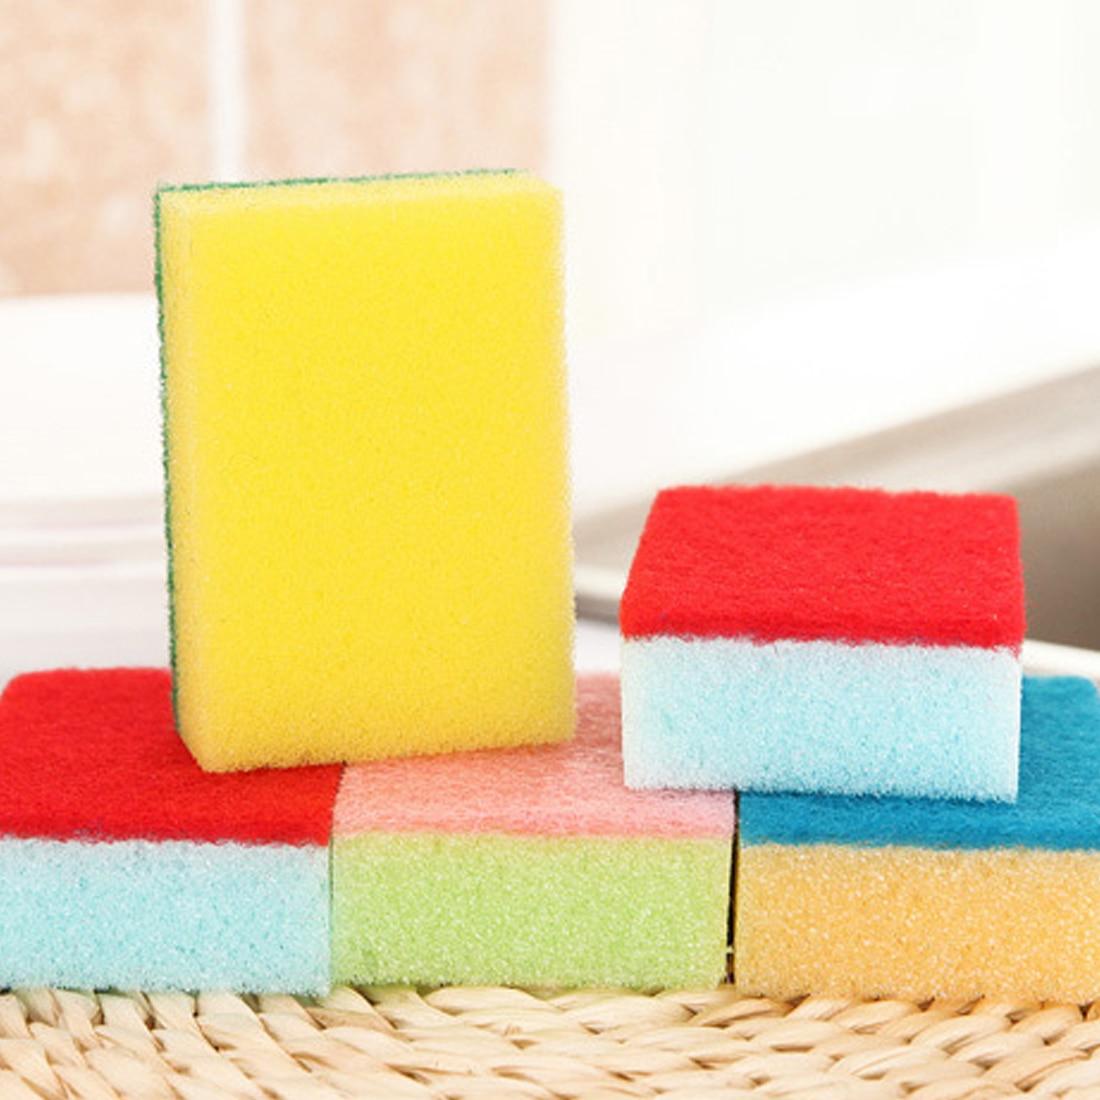 Best Nano Sponge Magic Eraser For Removing Rust Cleaning Cotton Emery Sponge Kitchen Supplies Descaling Clean Rub Pot